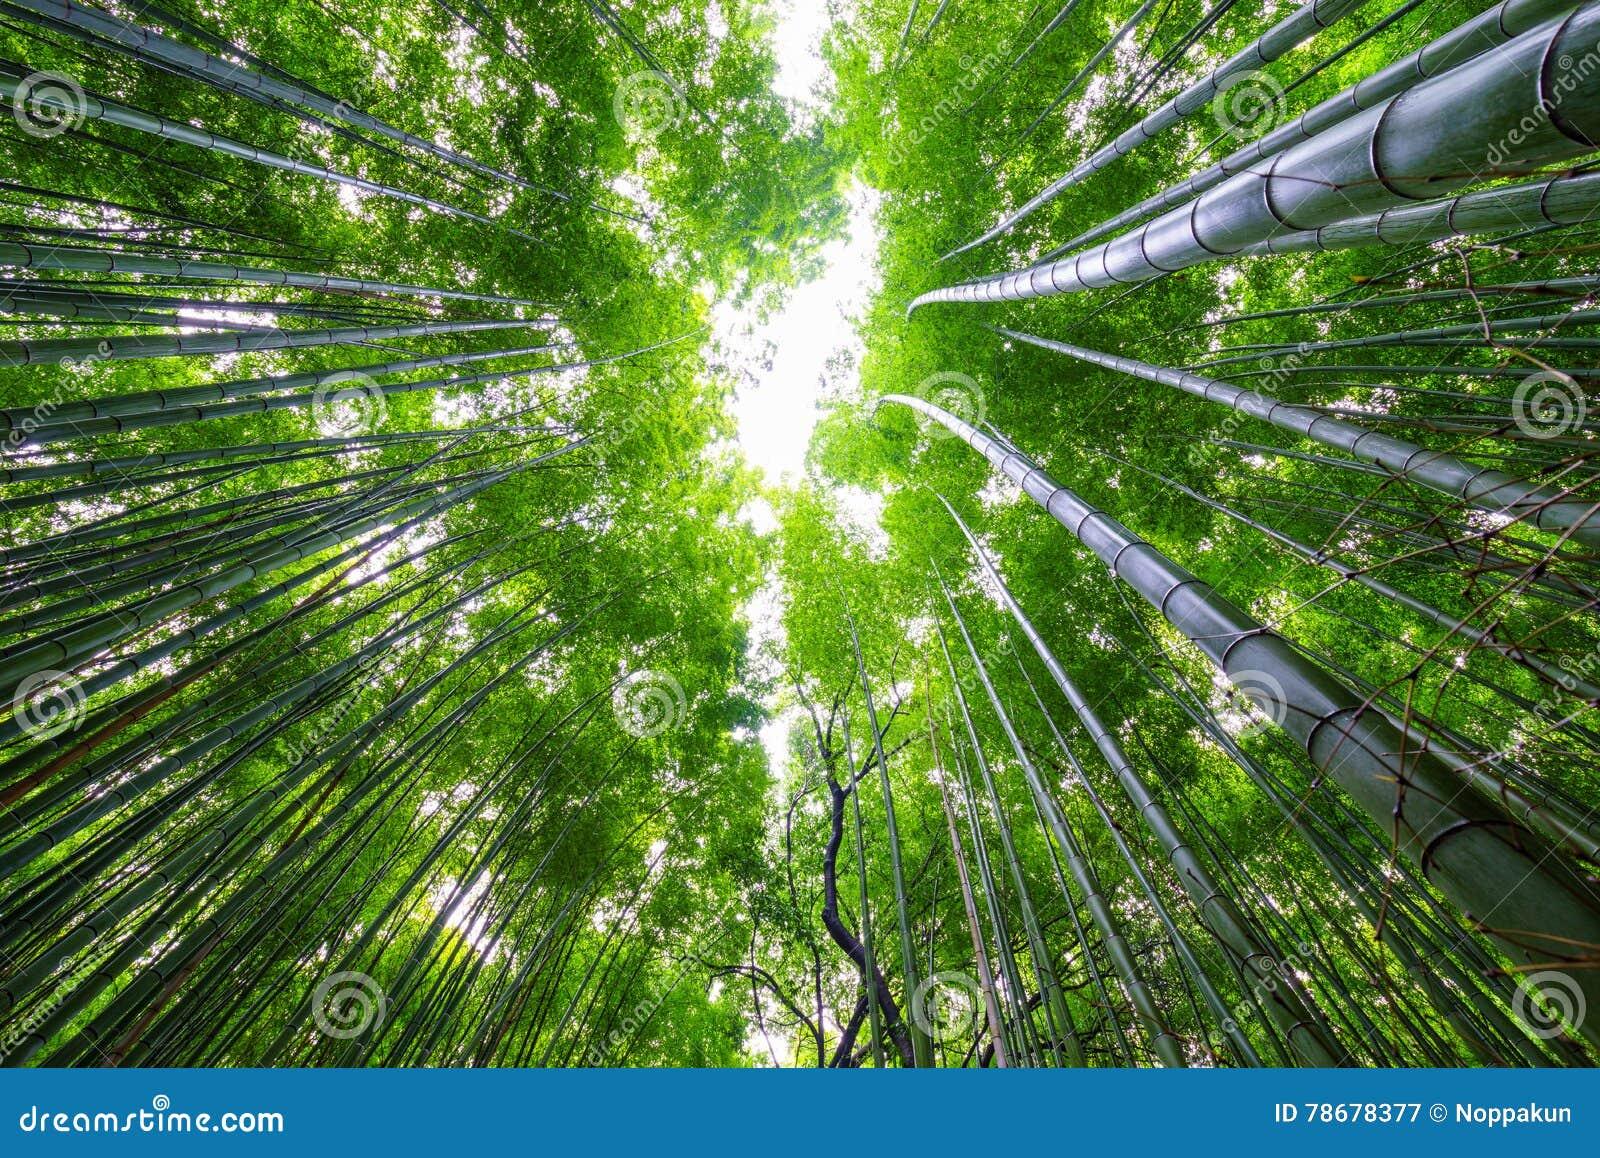 Bosque de bambú, Arashiyama, Kyoto, Japón